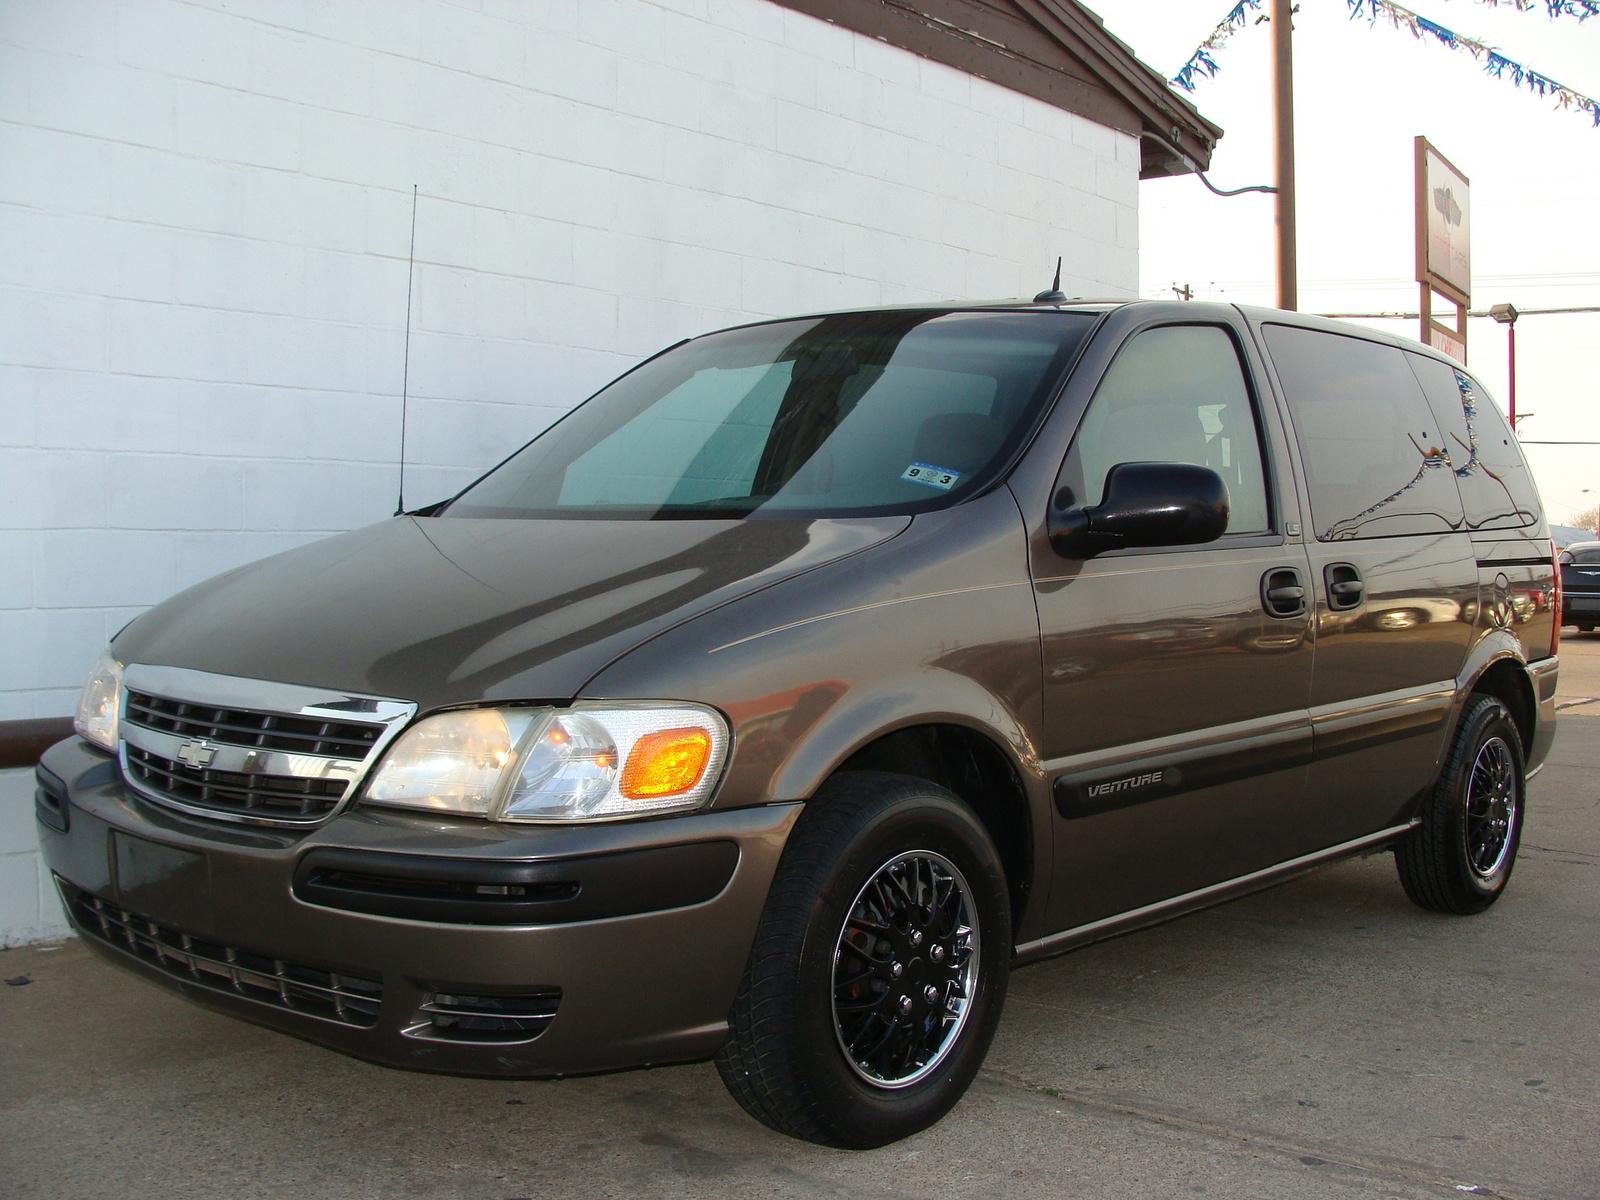 2004 Chevrolet Venture - Overview - CarGurus